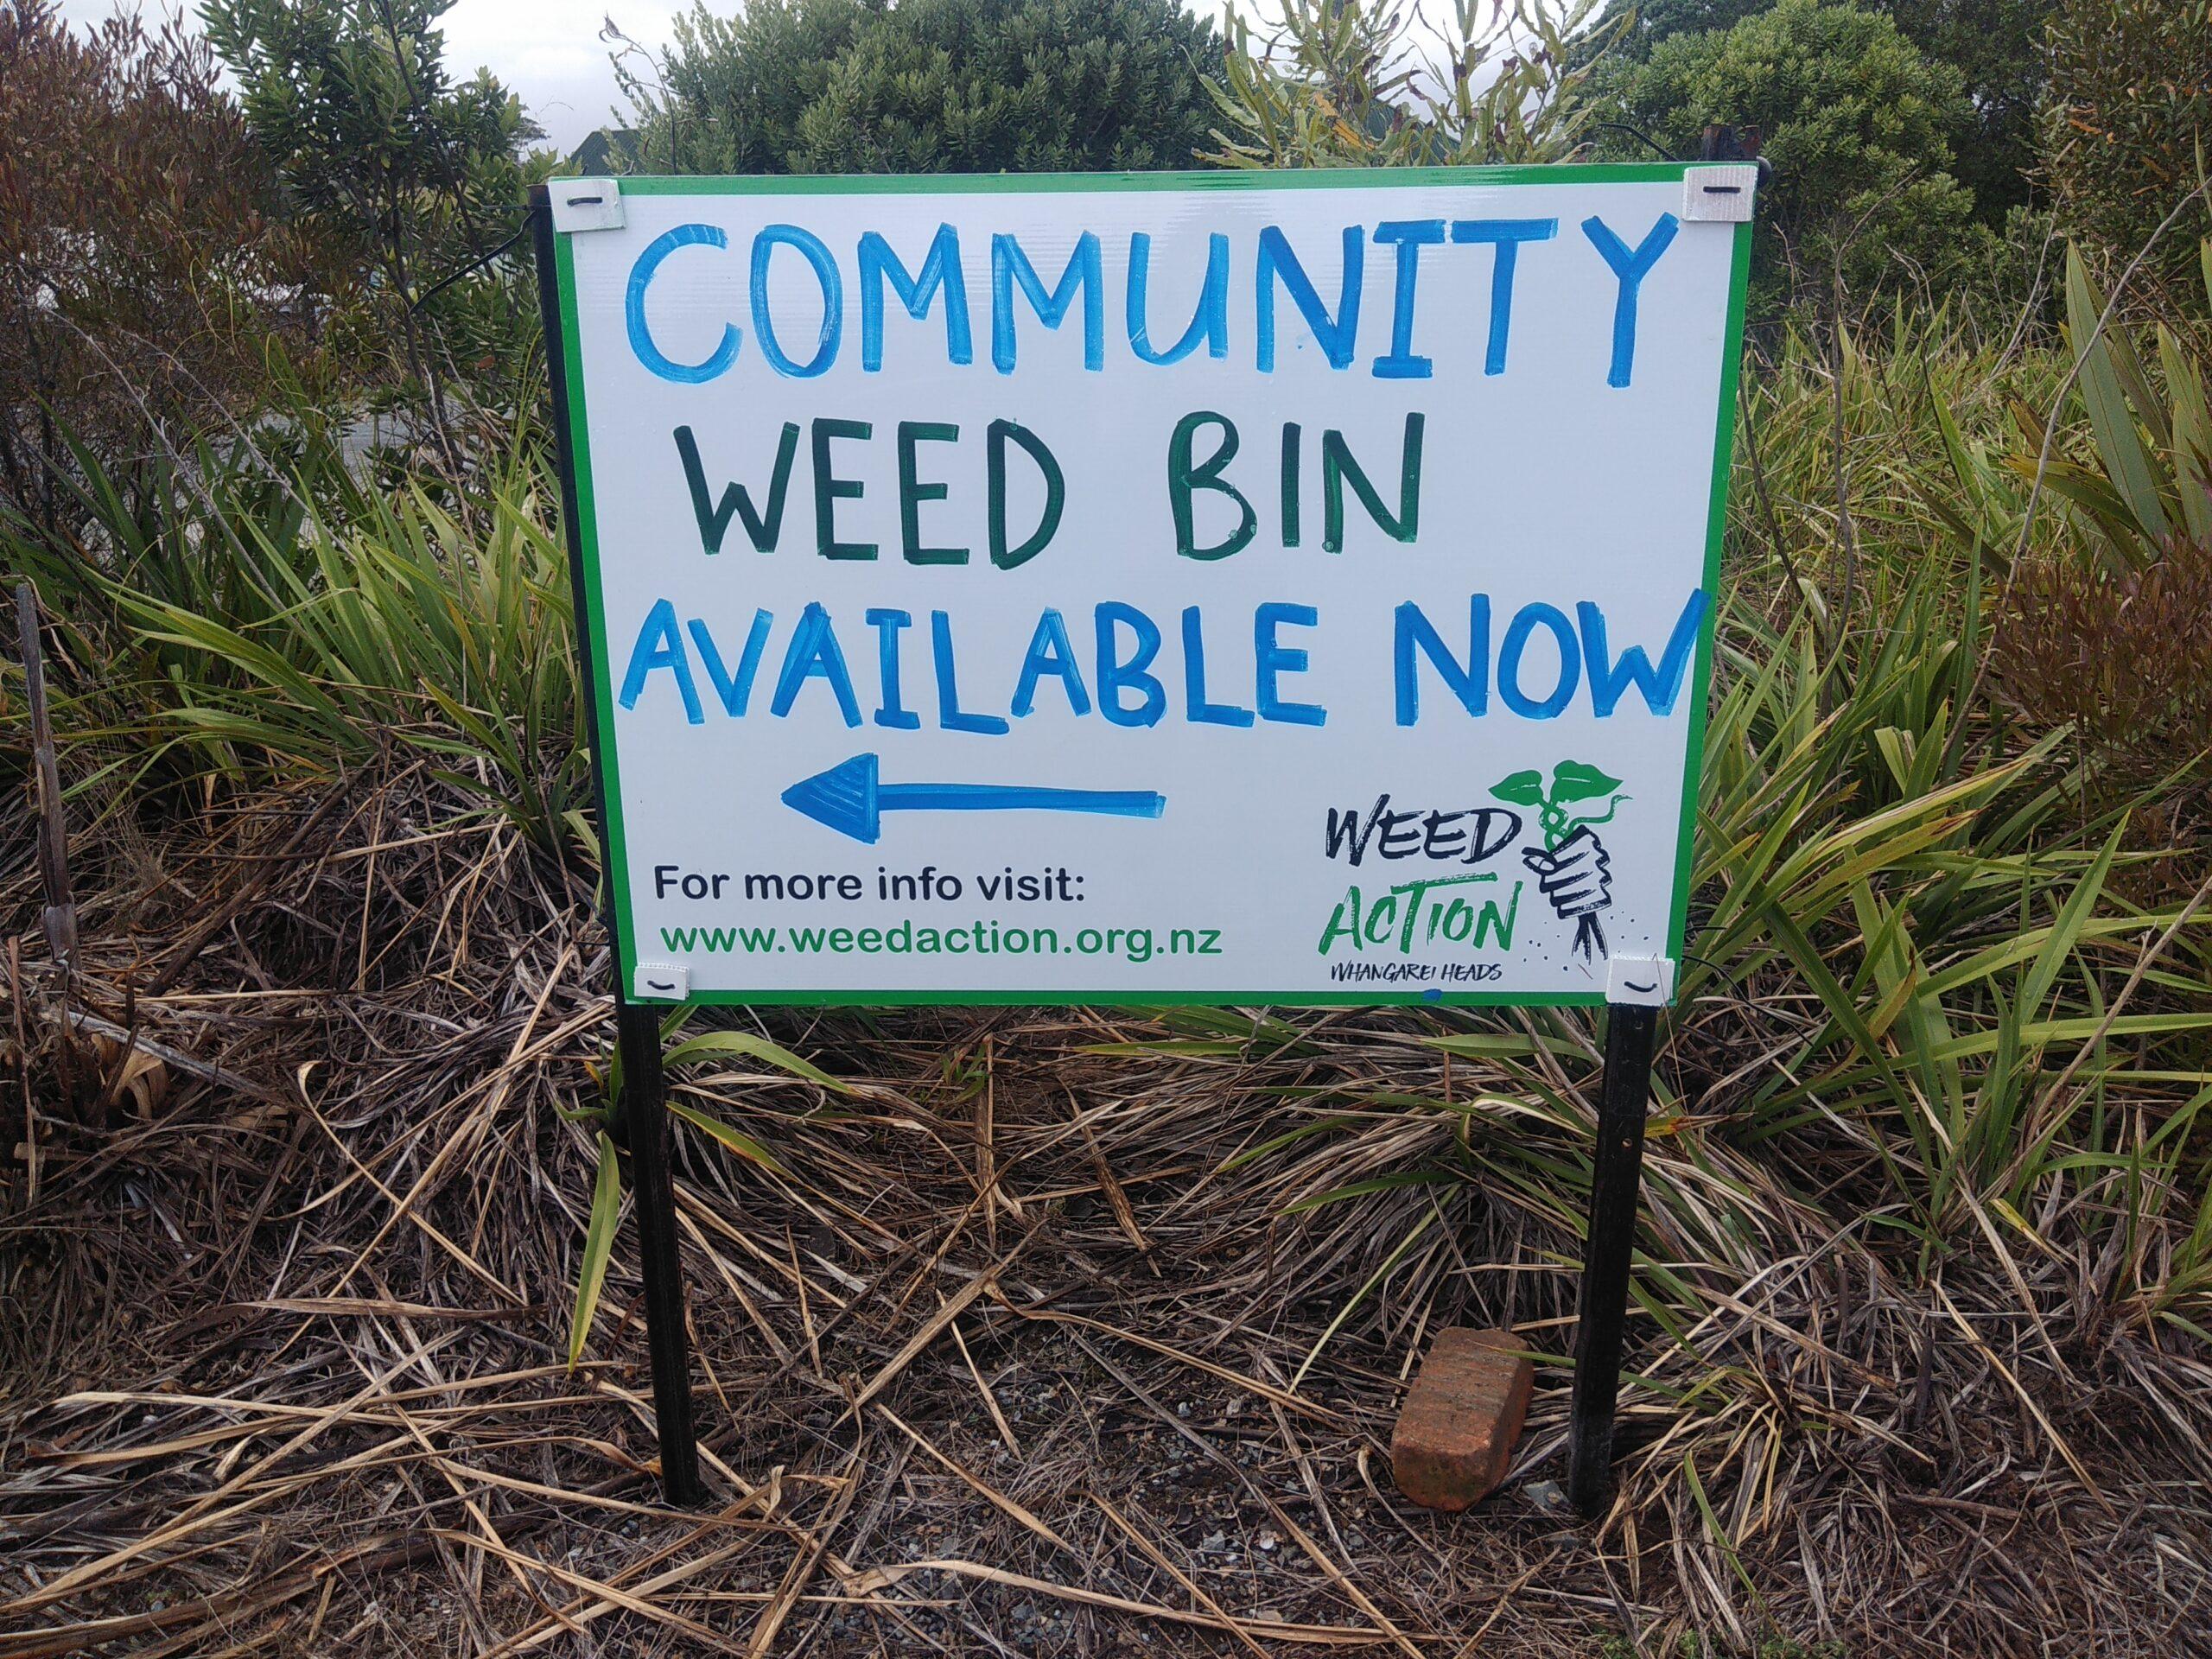 FREE Invasive Weed Disposal - Community Weed Amnesty